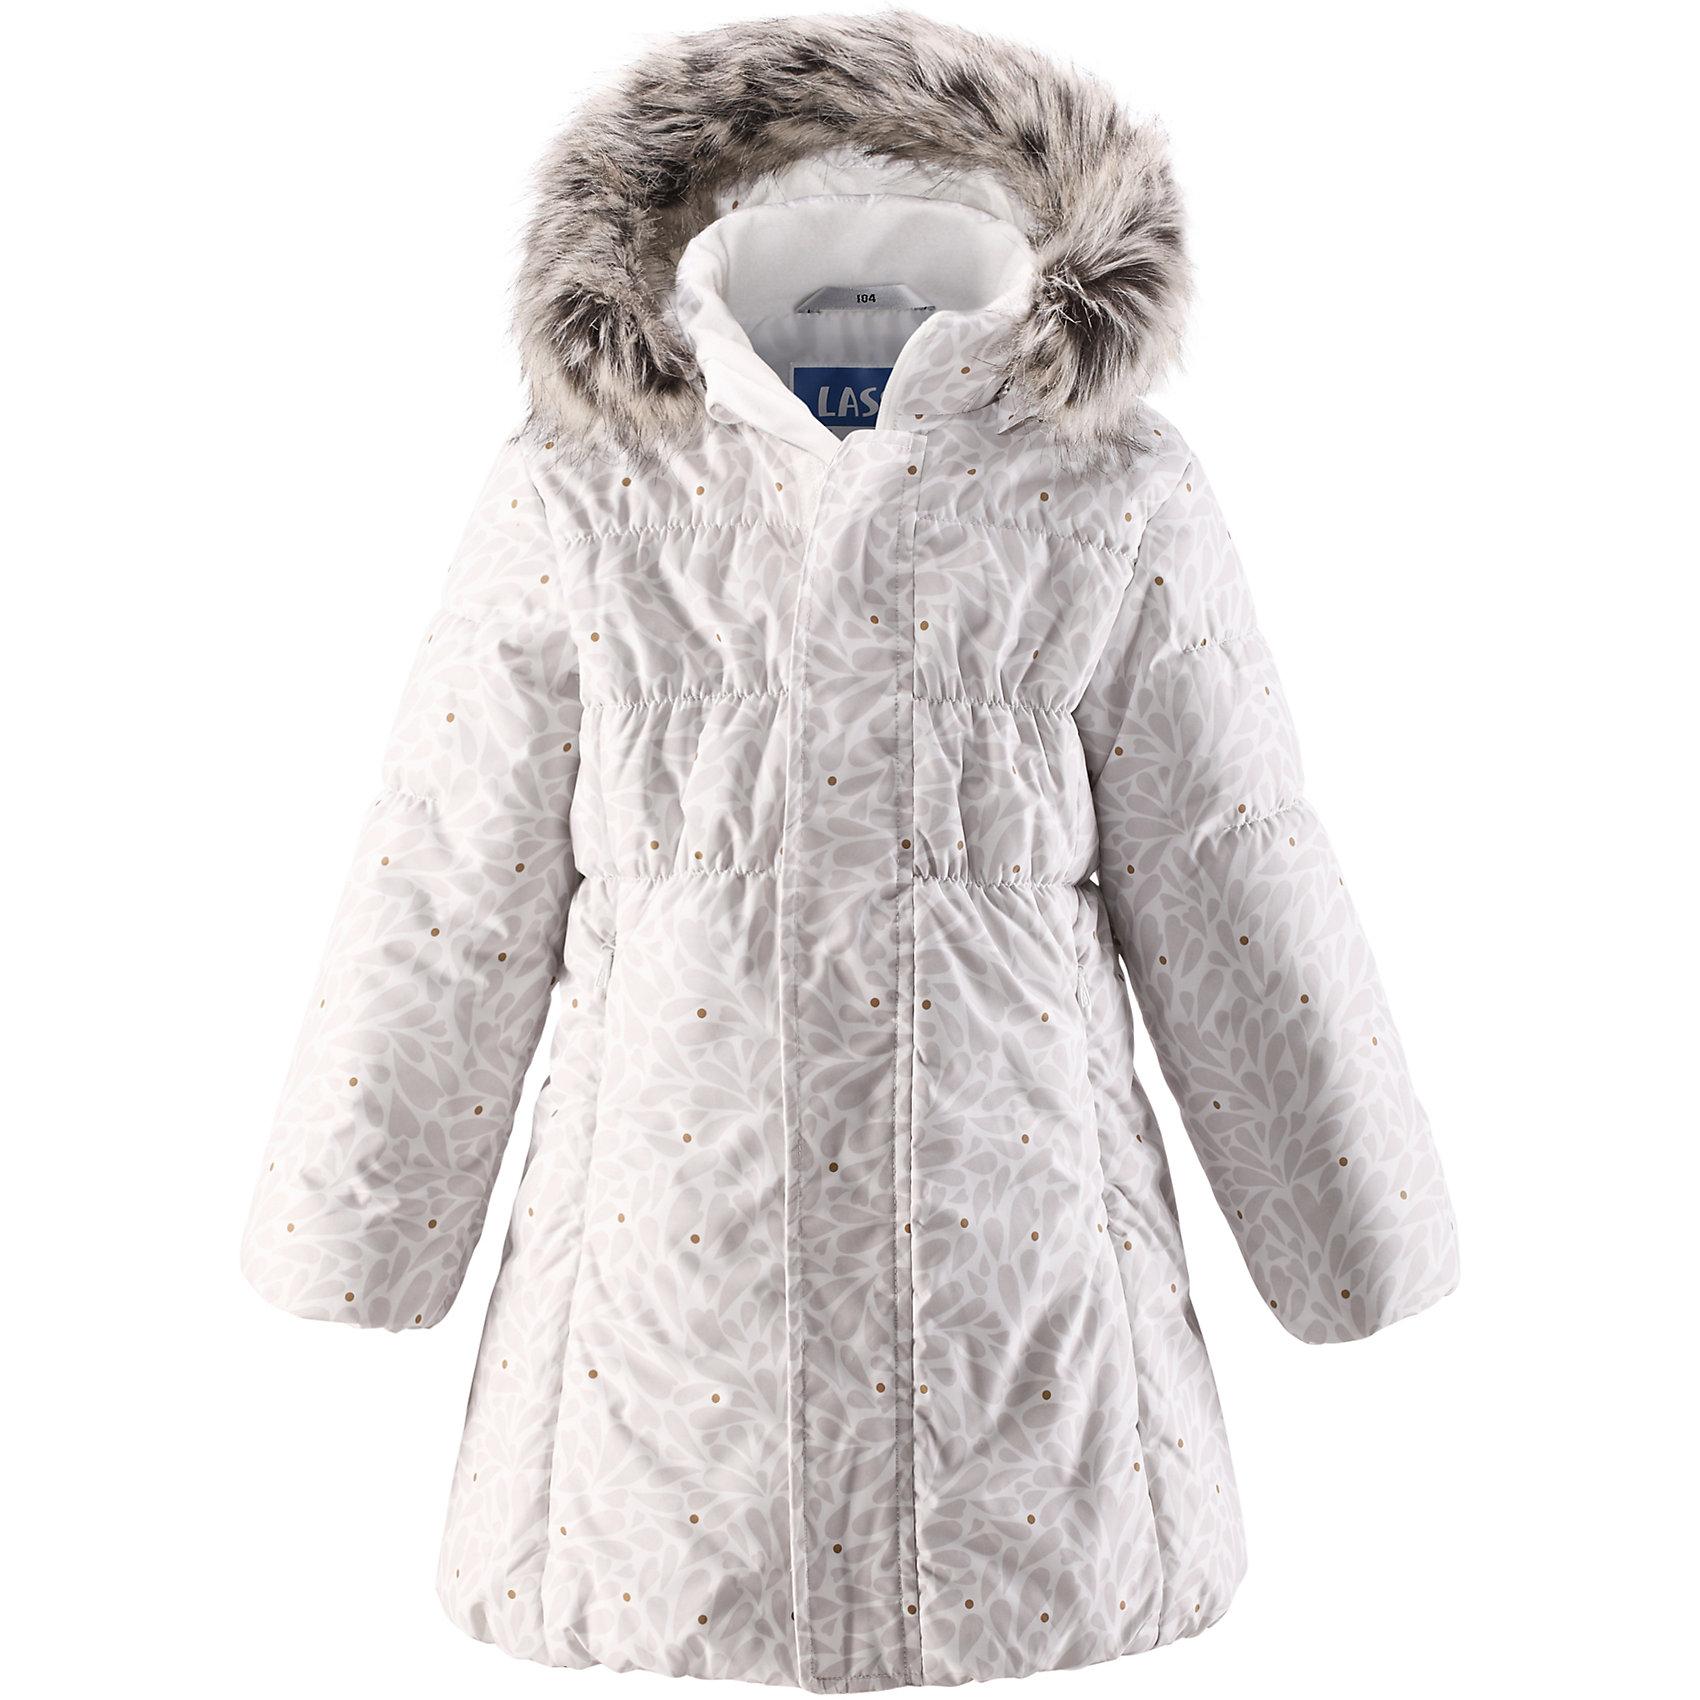 Пальто для девочки LASSIE by Reima 4782368